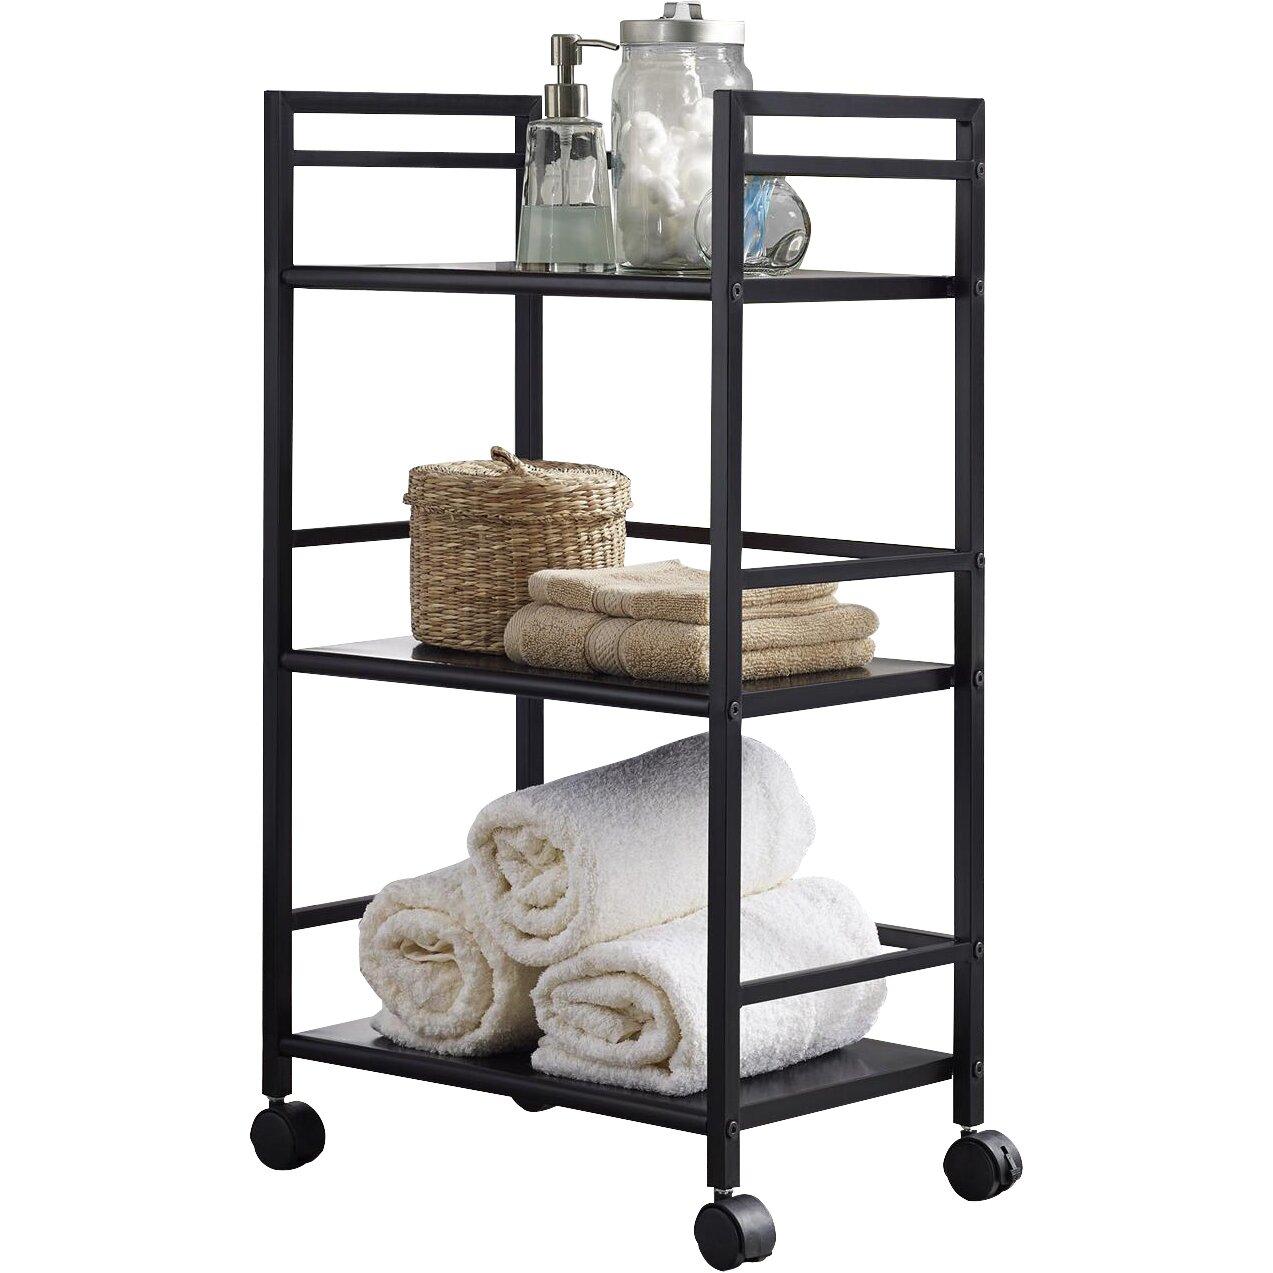 altra marshall three shelf rolling utility cart reviews. Black Bedroom Furniture Sets. Home Design Ideas